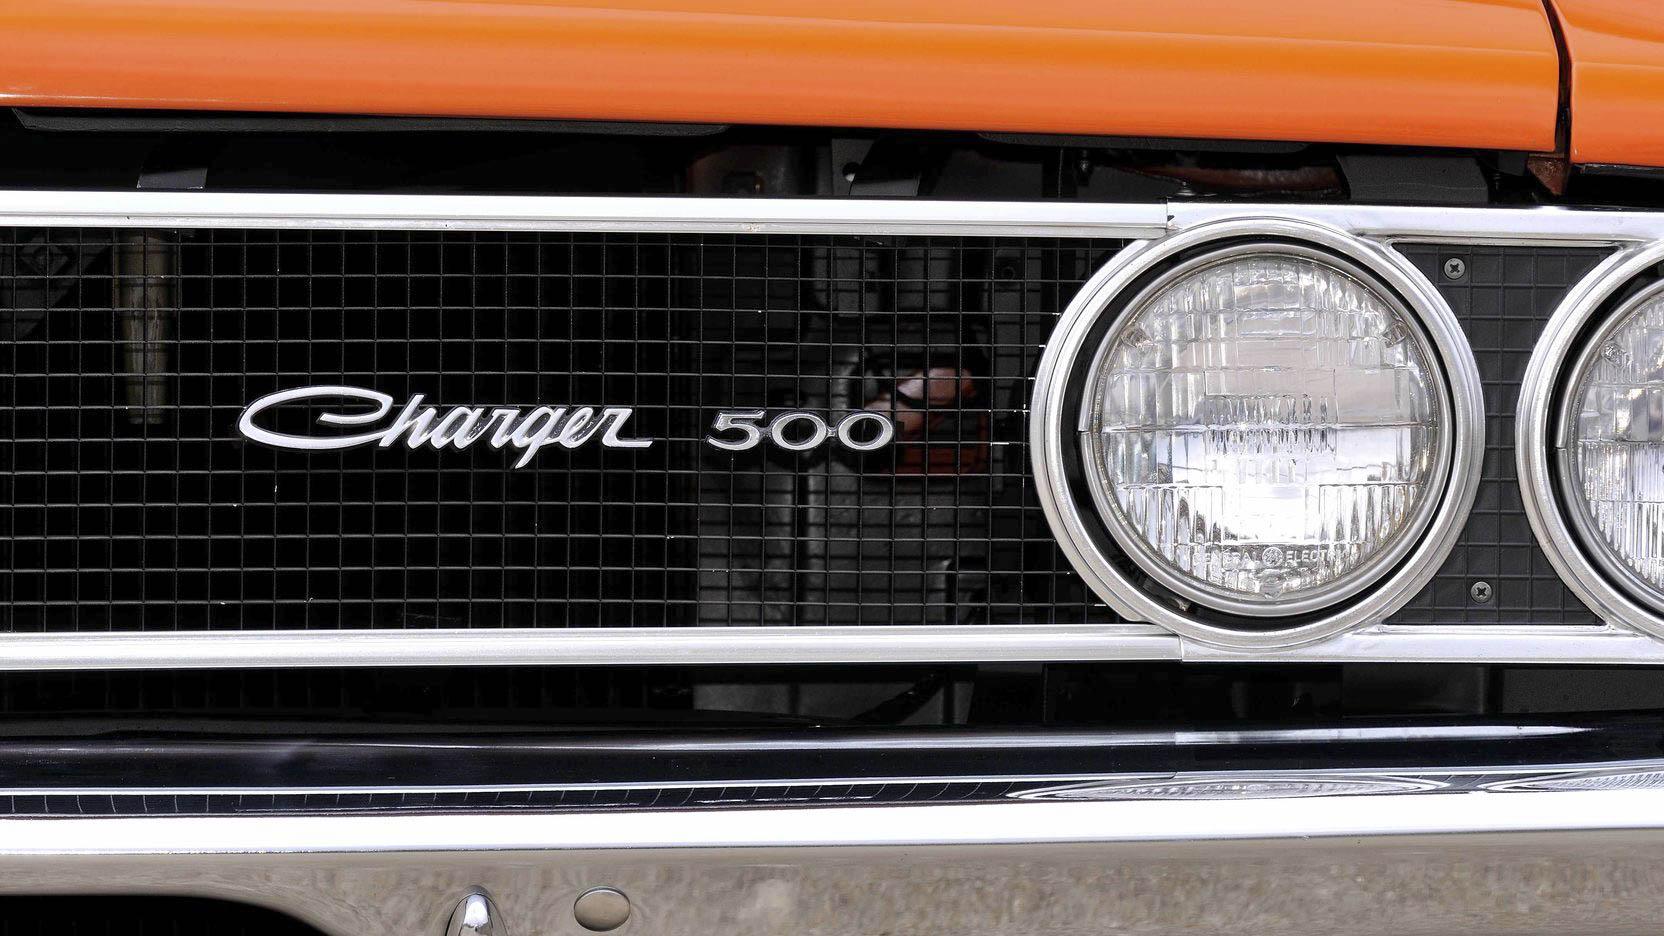 1969 Dodge Charger 500 badge detail